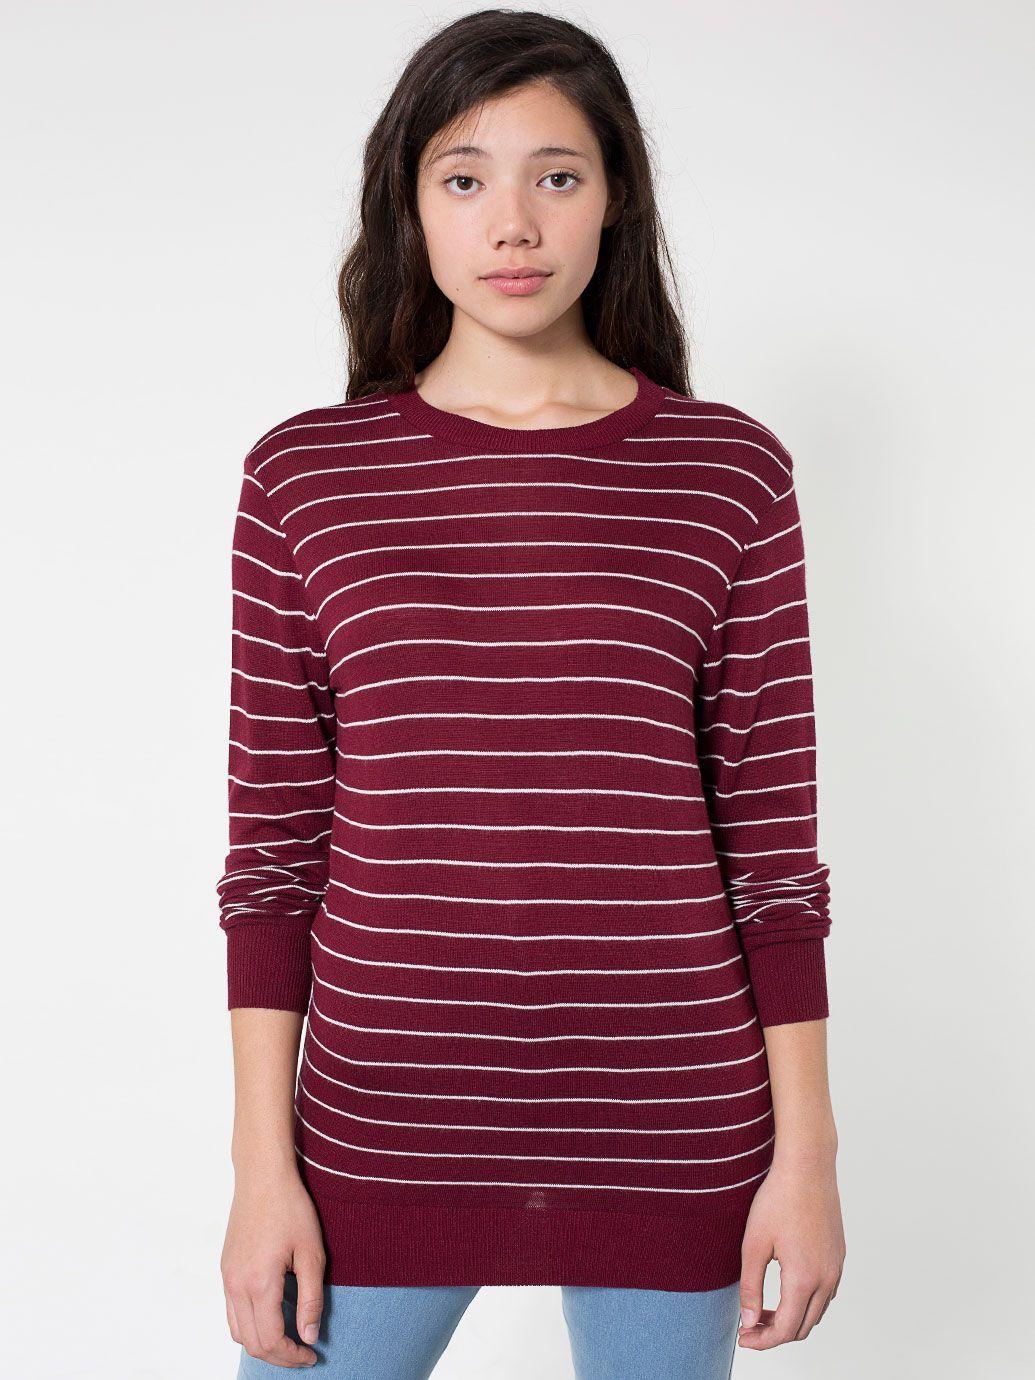 Unisex Knit Sweater Crew Neck 105